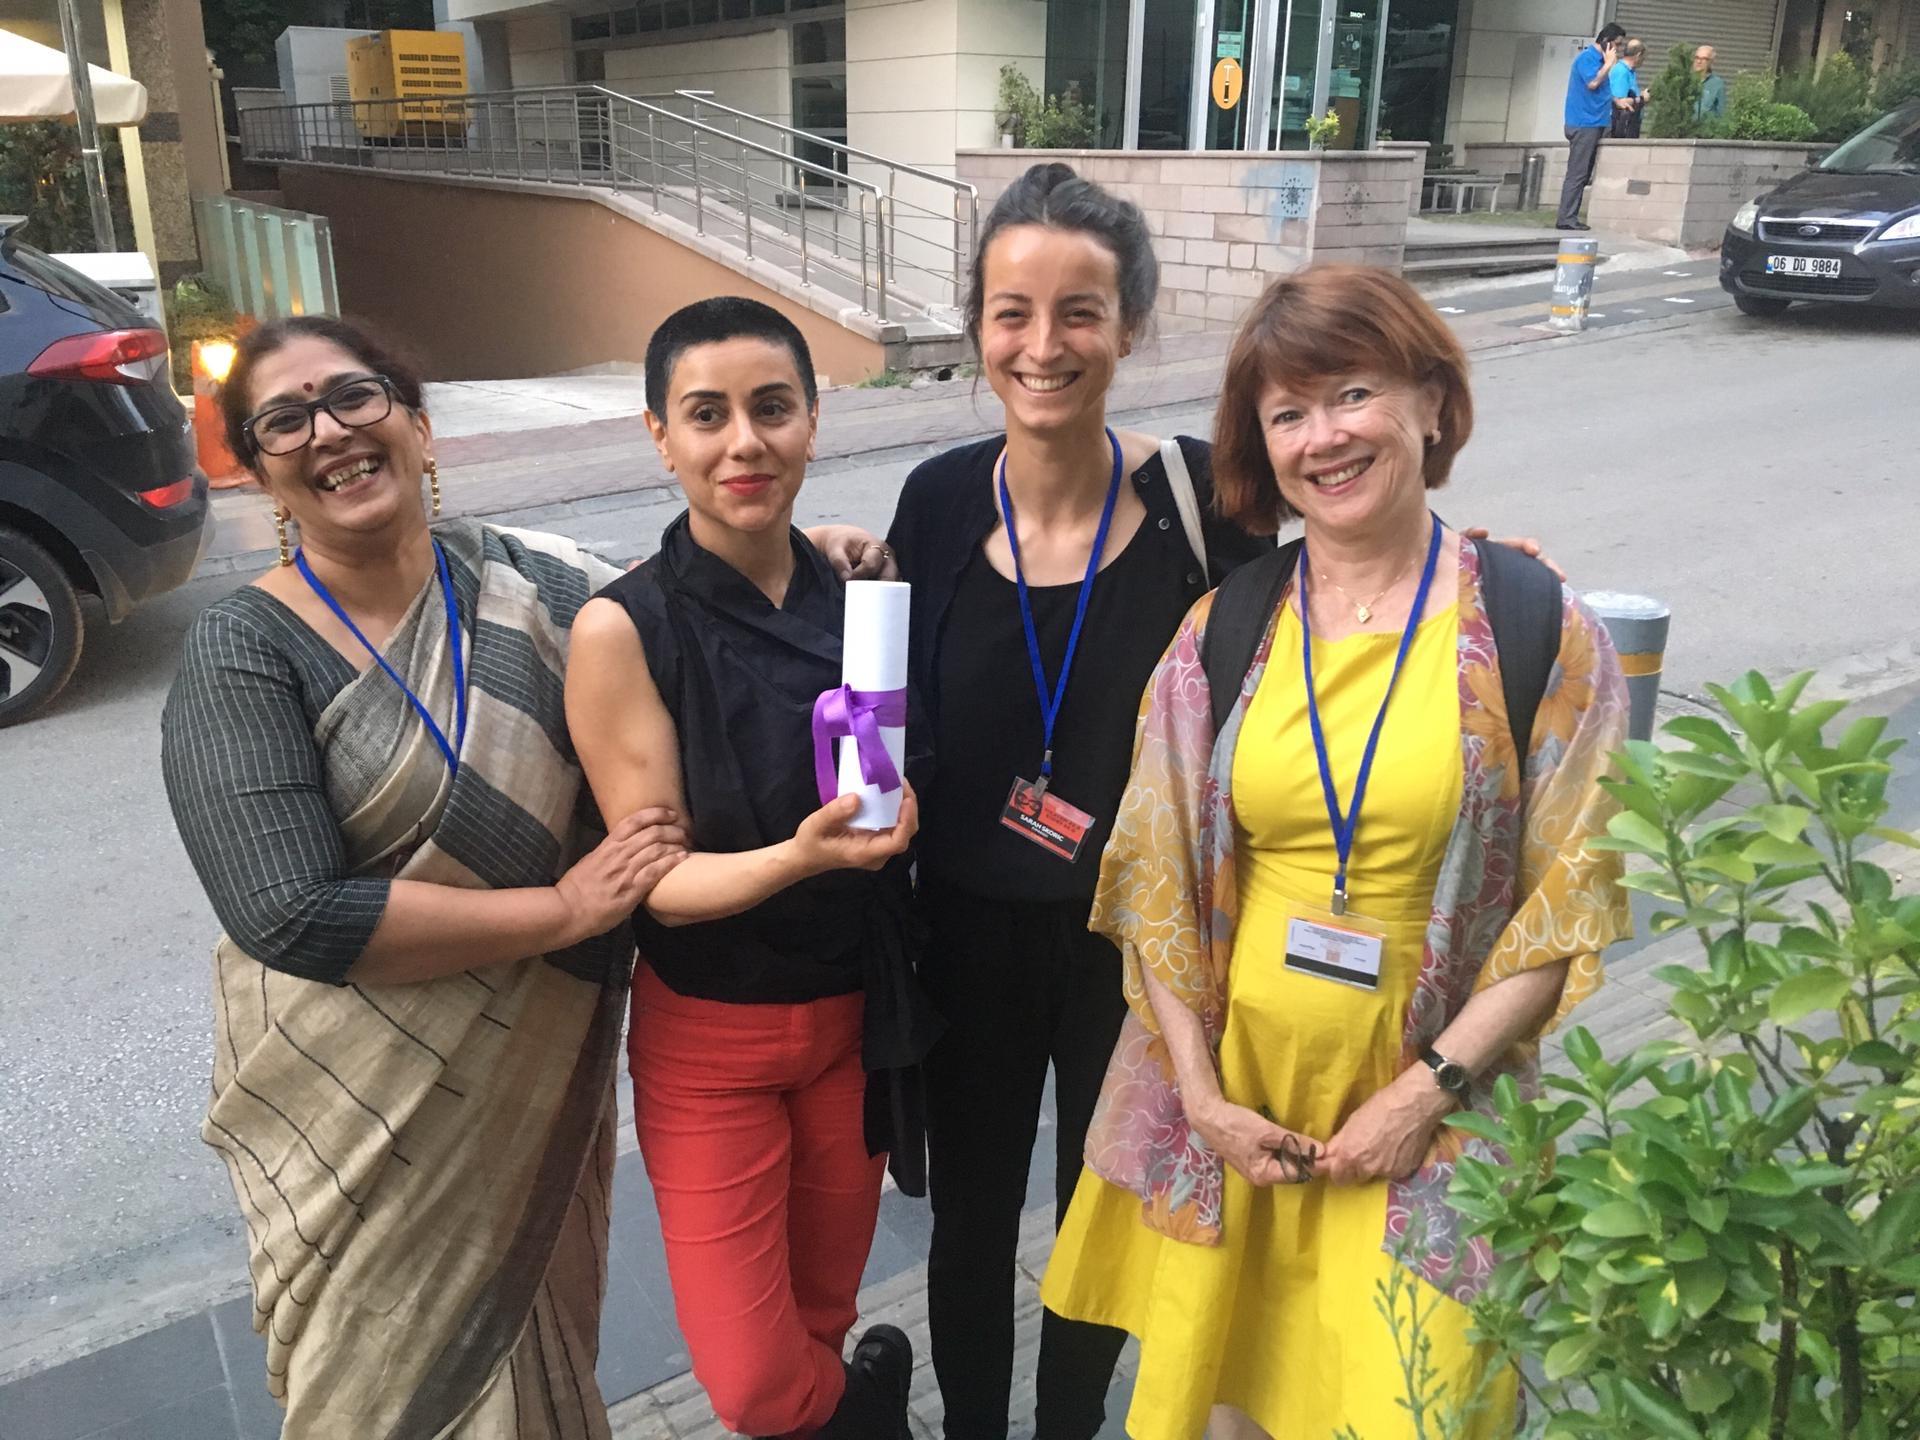 Fipresci-juryen og dens vinner i Ankara: Fra venstre Meena Karnik, India, Mania Akbari, Iran, Sarah Skoric, Belgia, og Kristin Aalen, Norge.